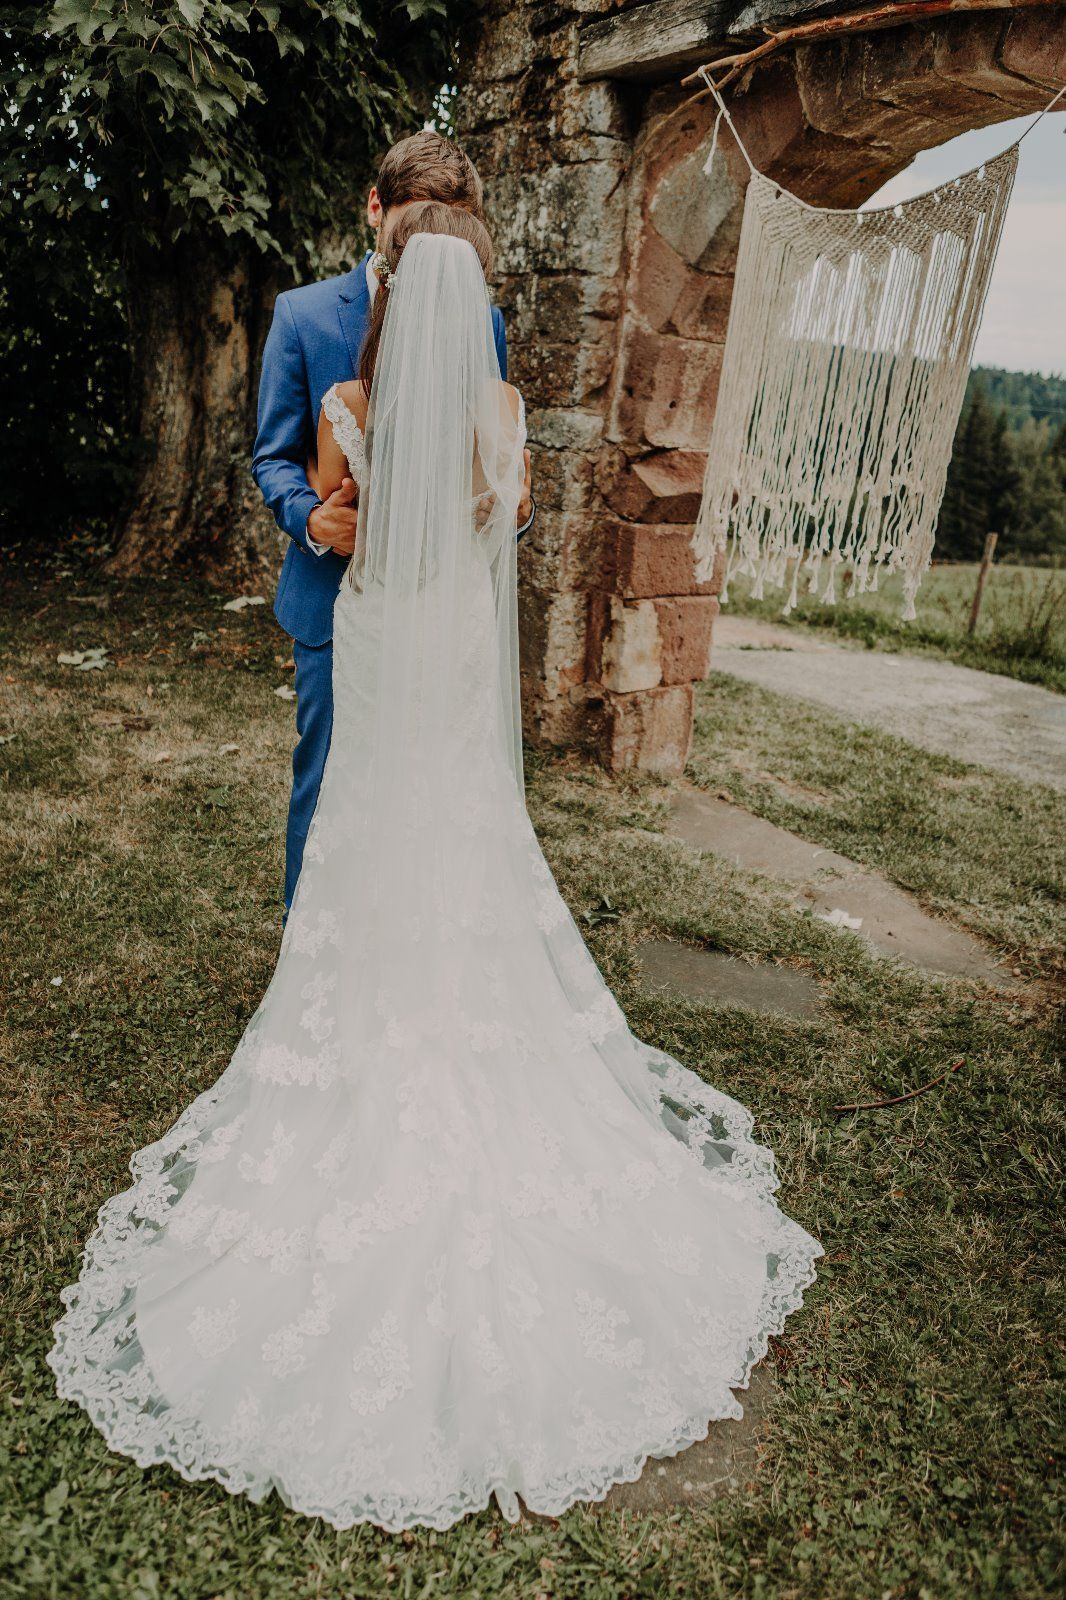 Brautkleid Victoria&Vincent Hannele V&V Gebraucht 15 Euro VHB